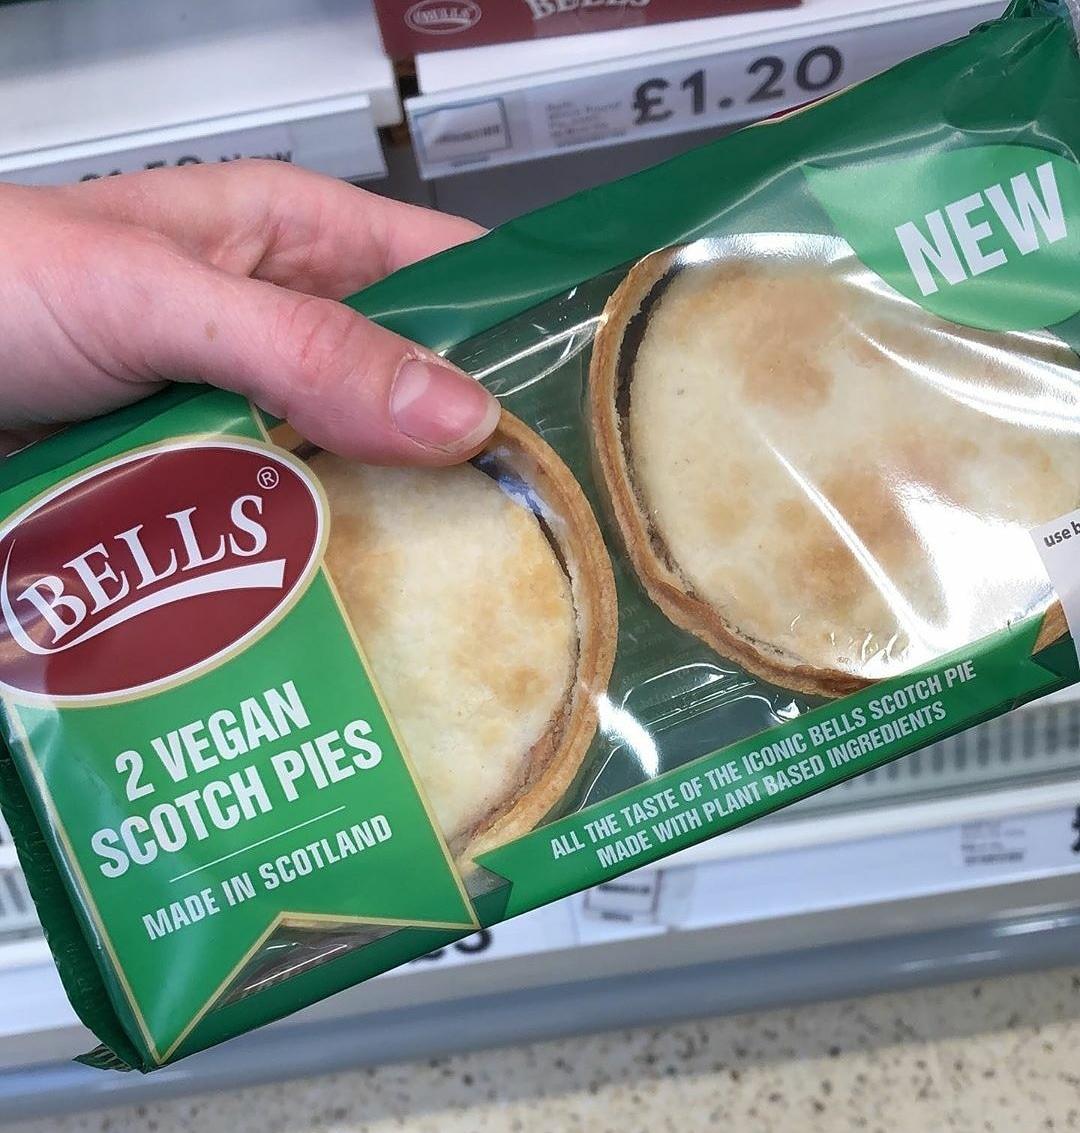 Bells 2 Vegan Scotch Pies | Vegan Food UK